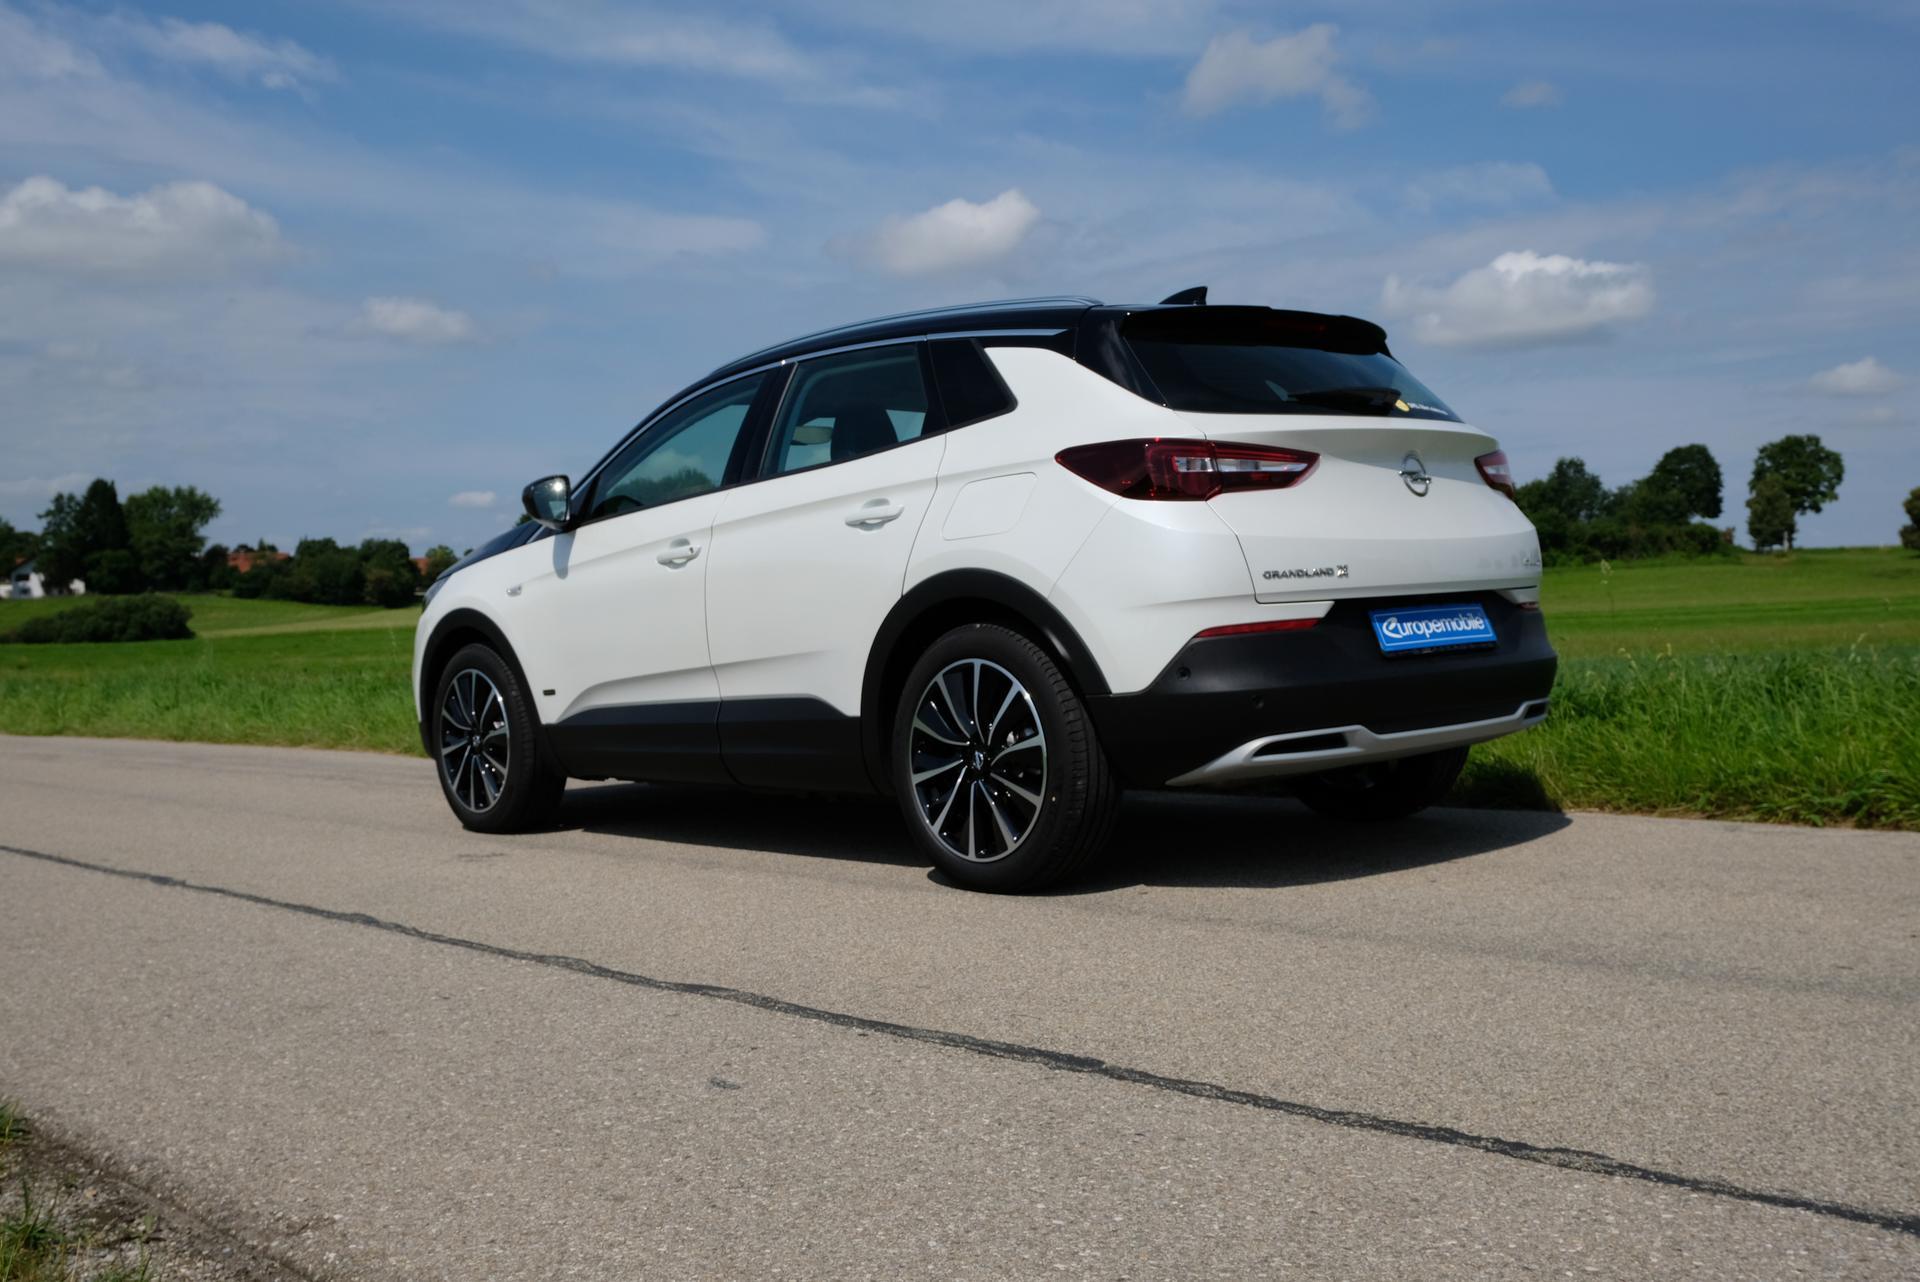 Opel Grandland X hinten